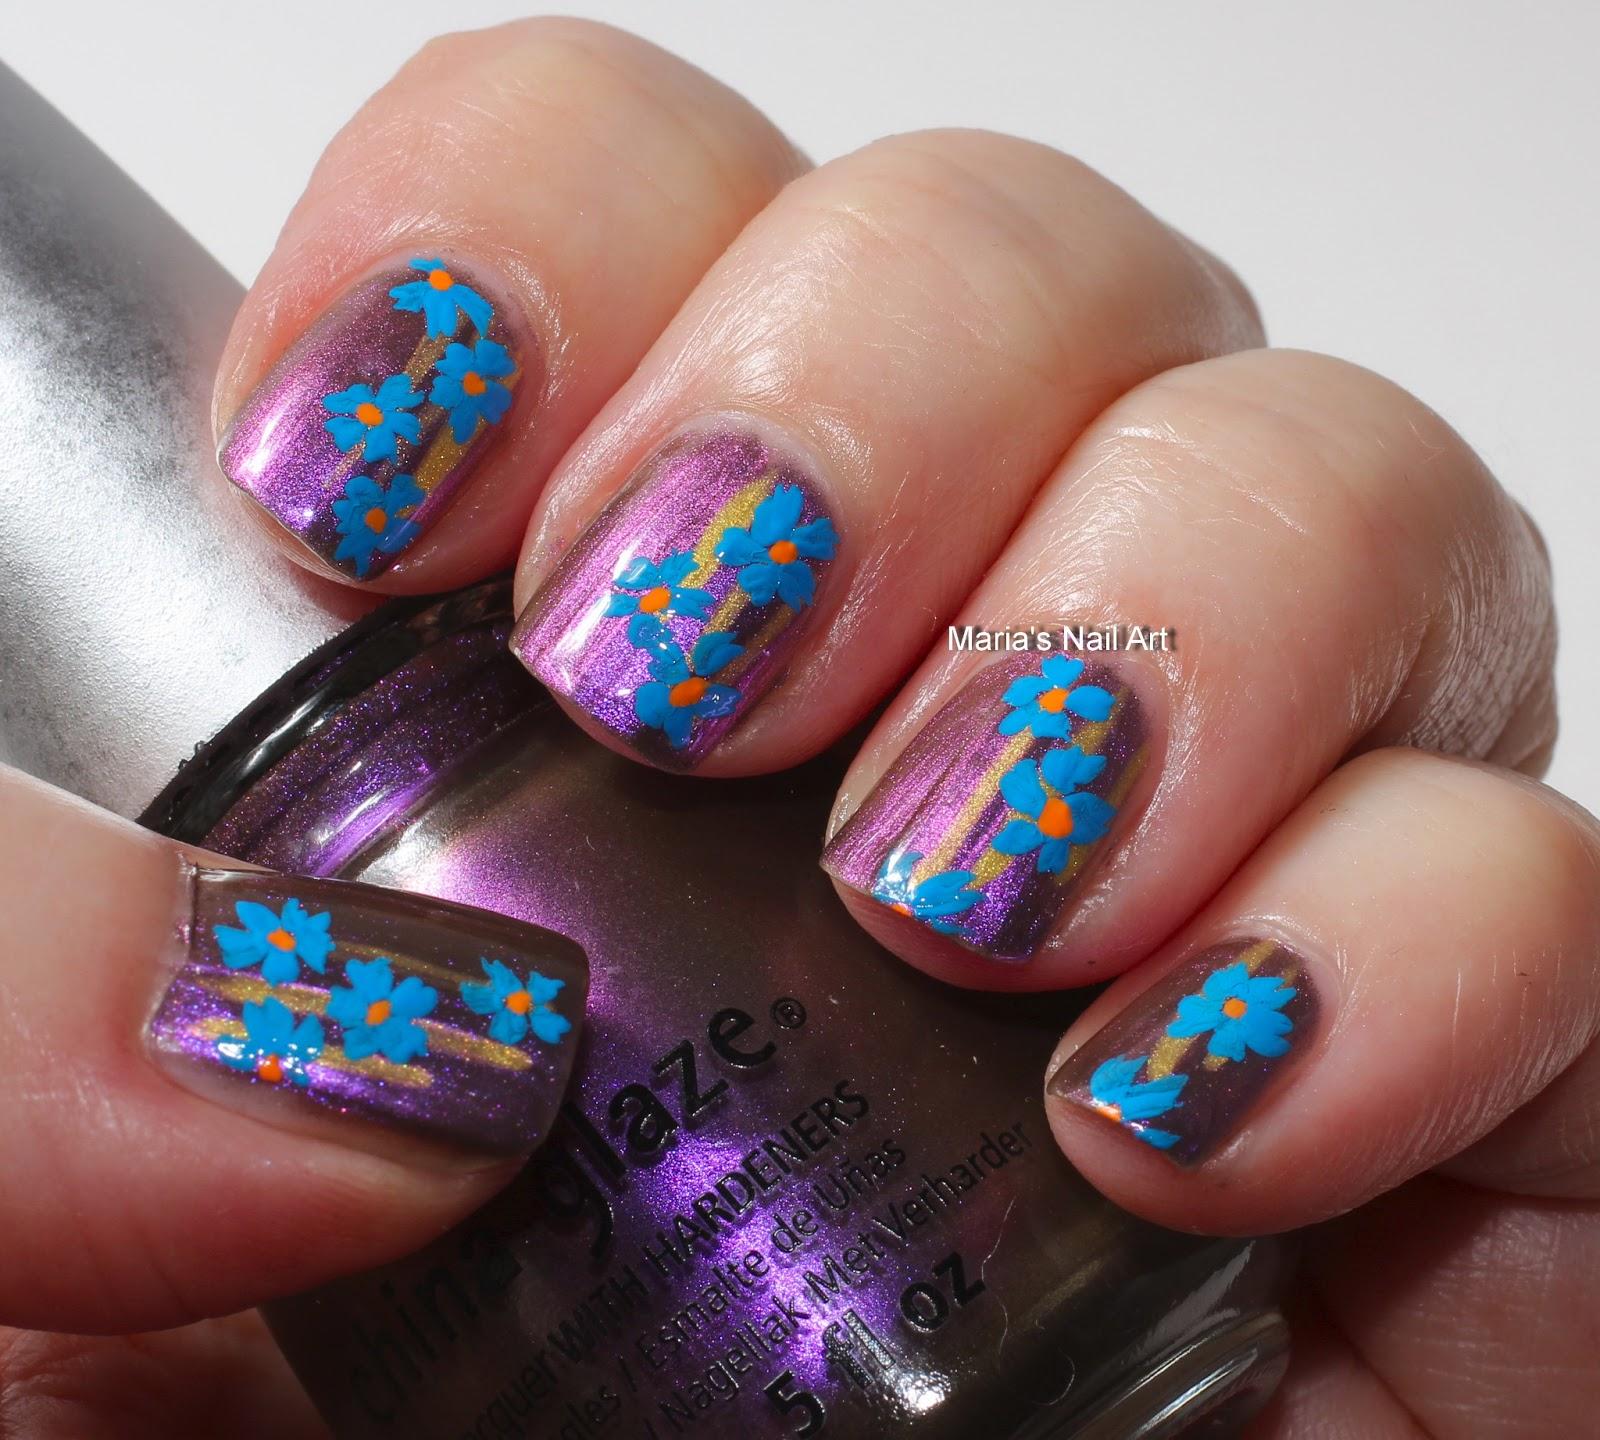 Marias Nail Art And Polish Blog Plain Flowers For Jane